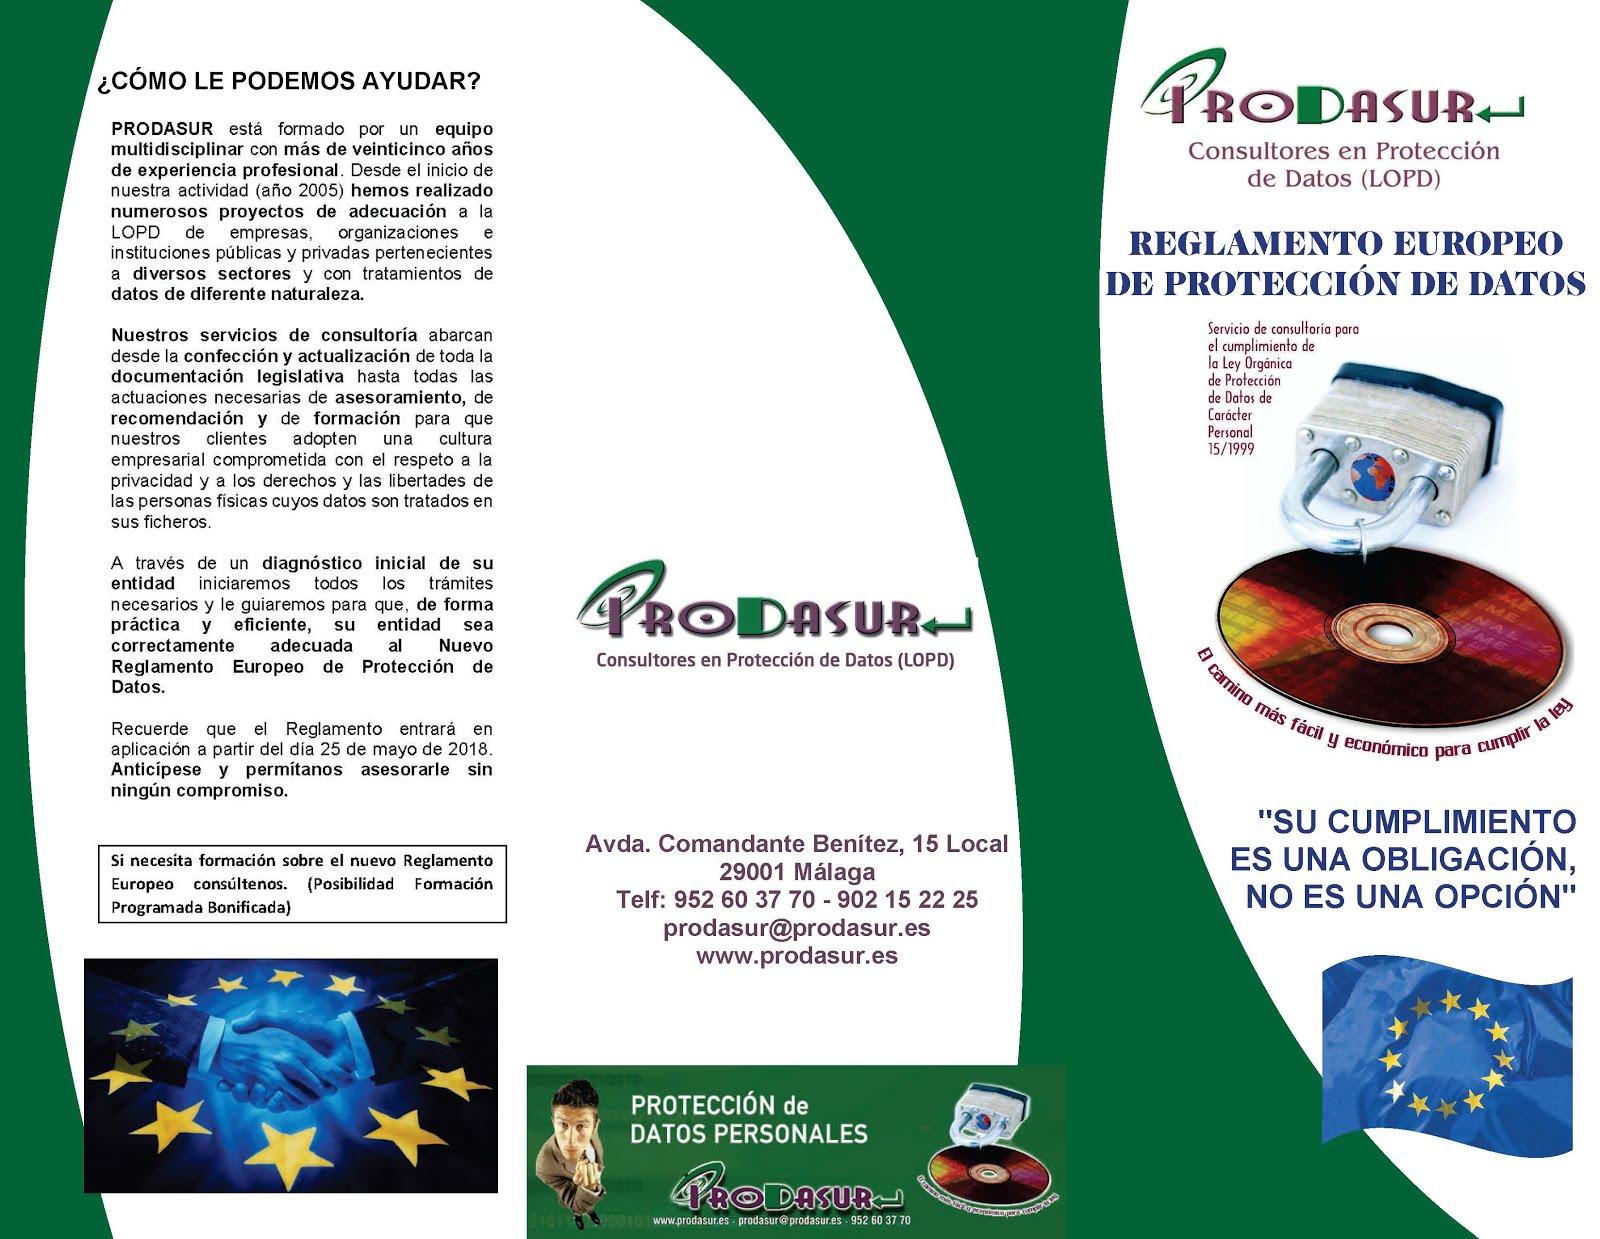 TRIPTICO RGPD - REGLAMENTO EUROPEO PROTECCION DE DATOS